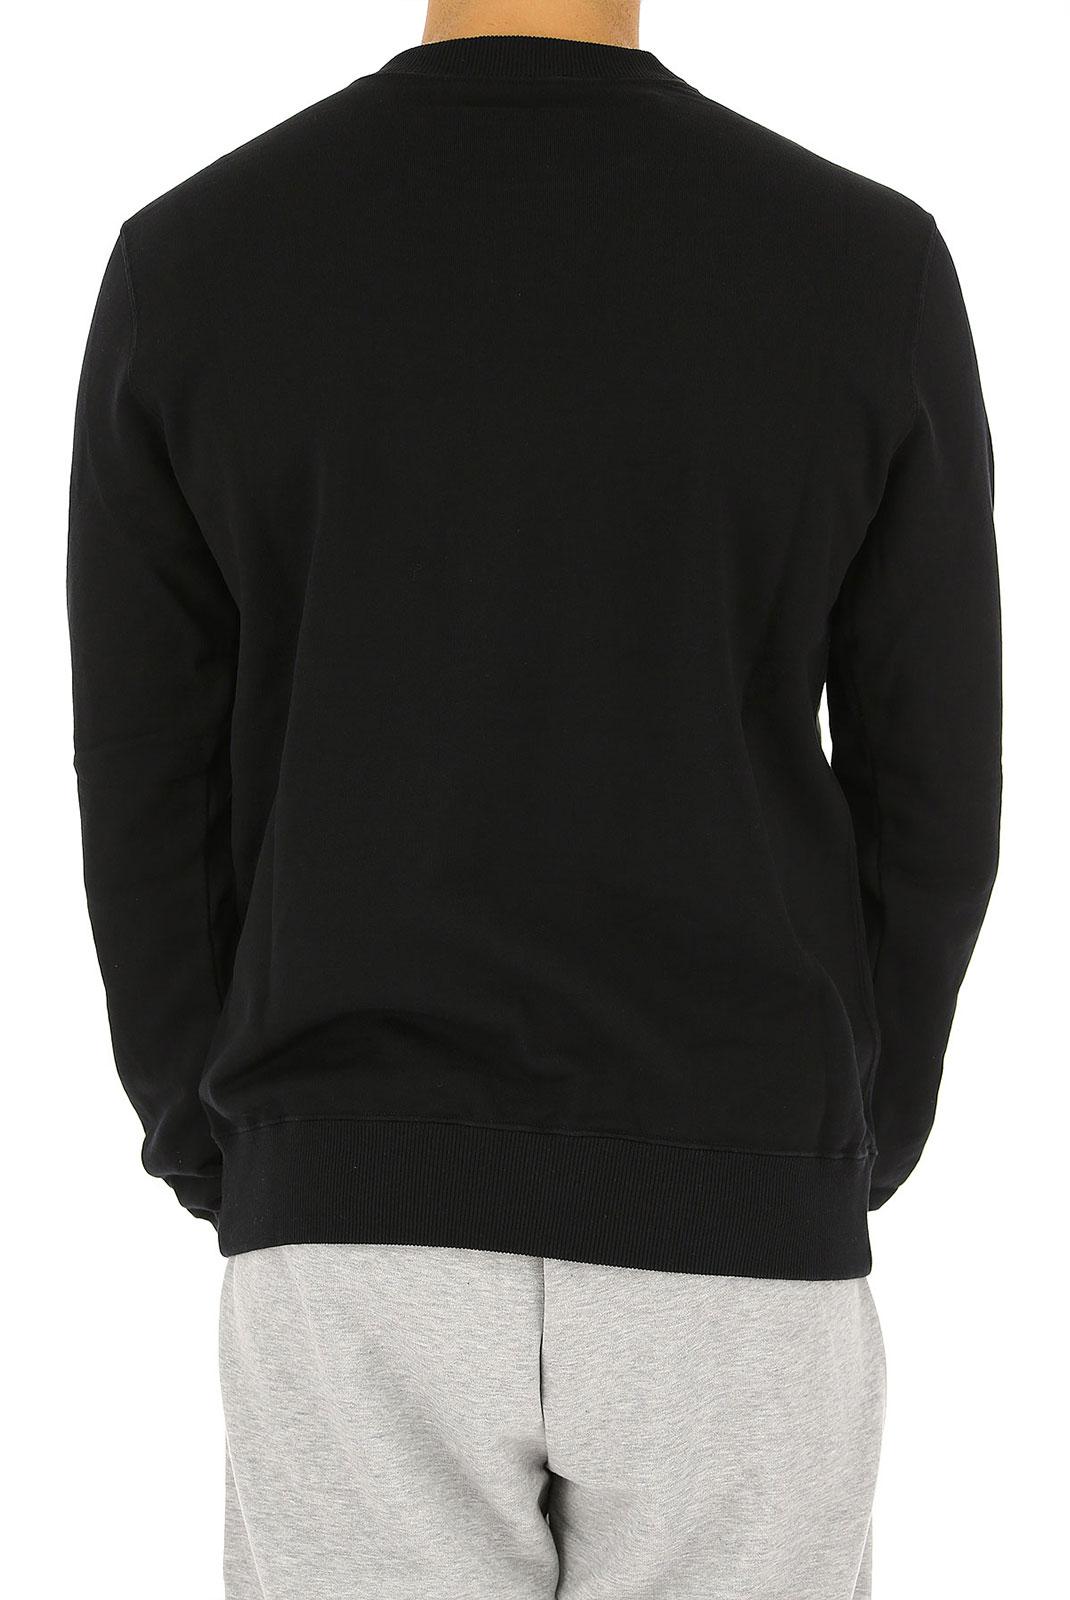 Sweatshirts  Dolce&Gabbana G9MI5T N0000 BLACK